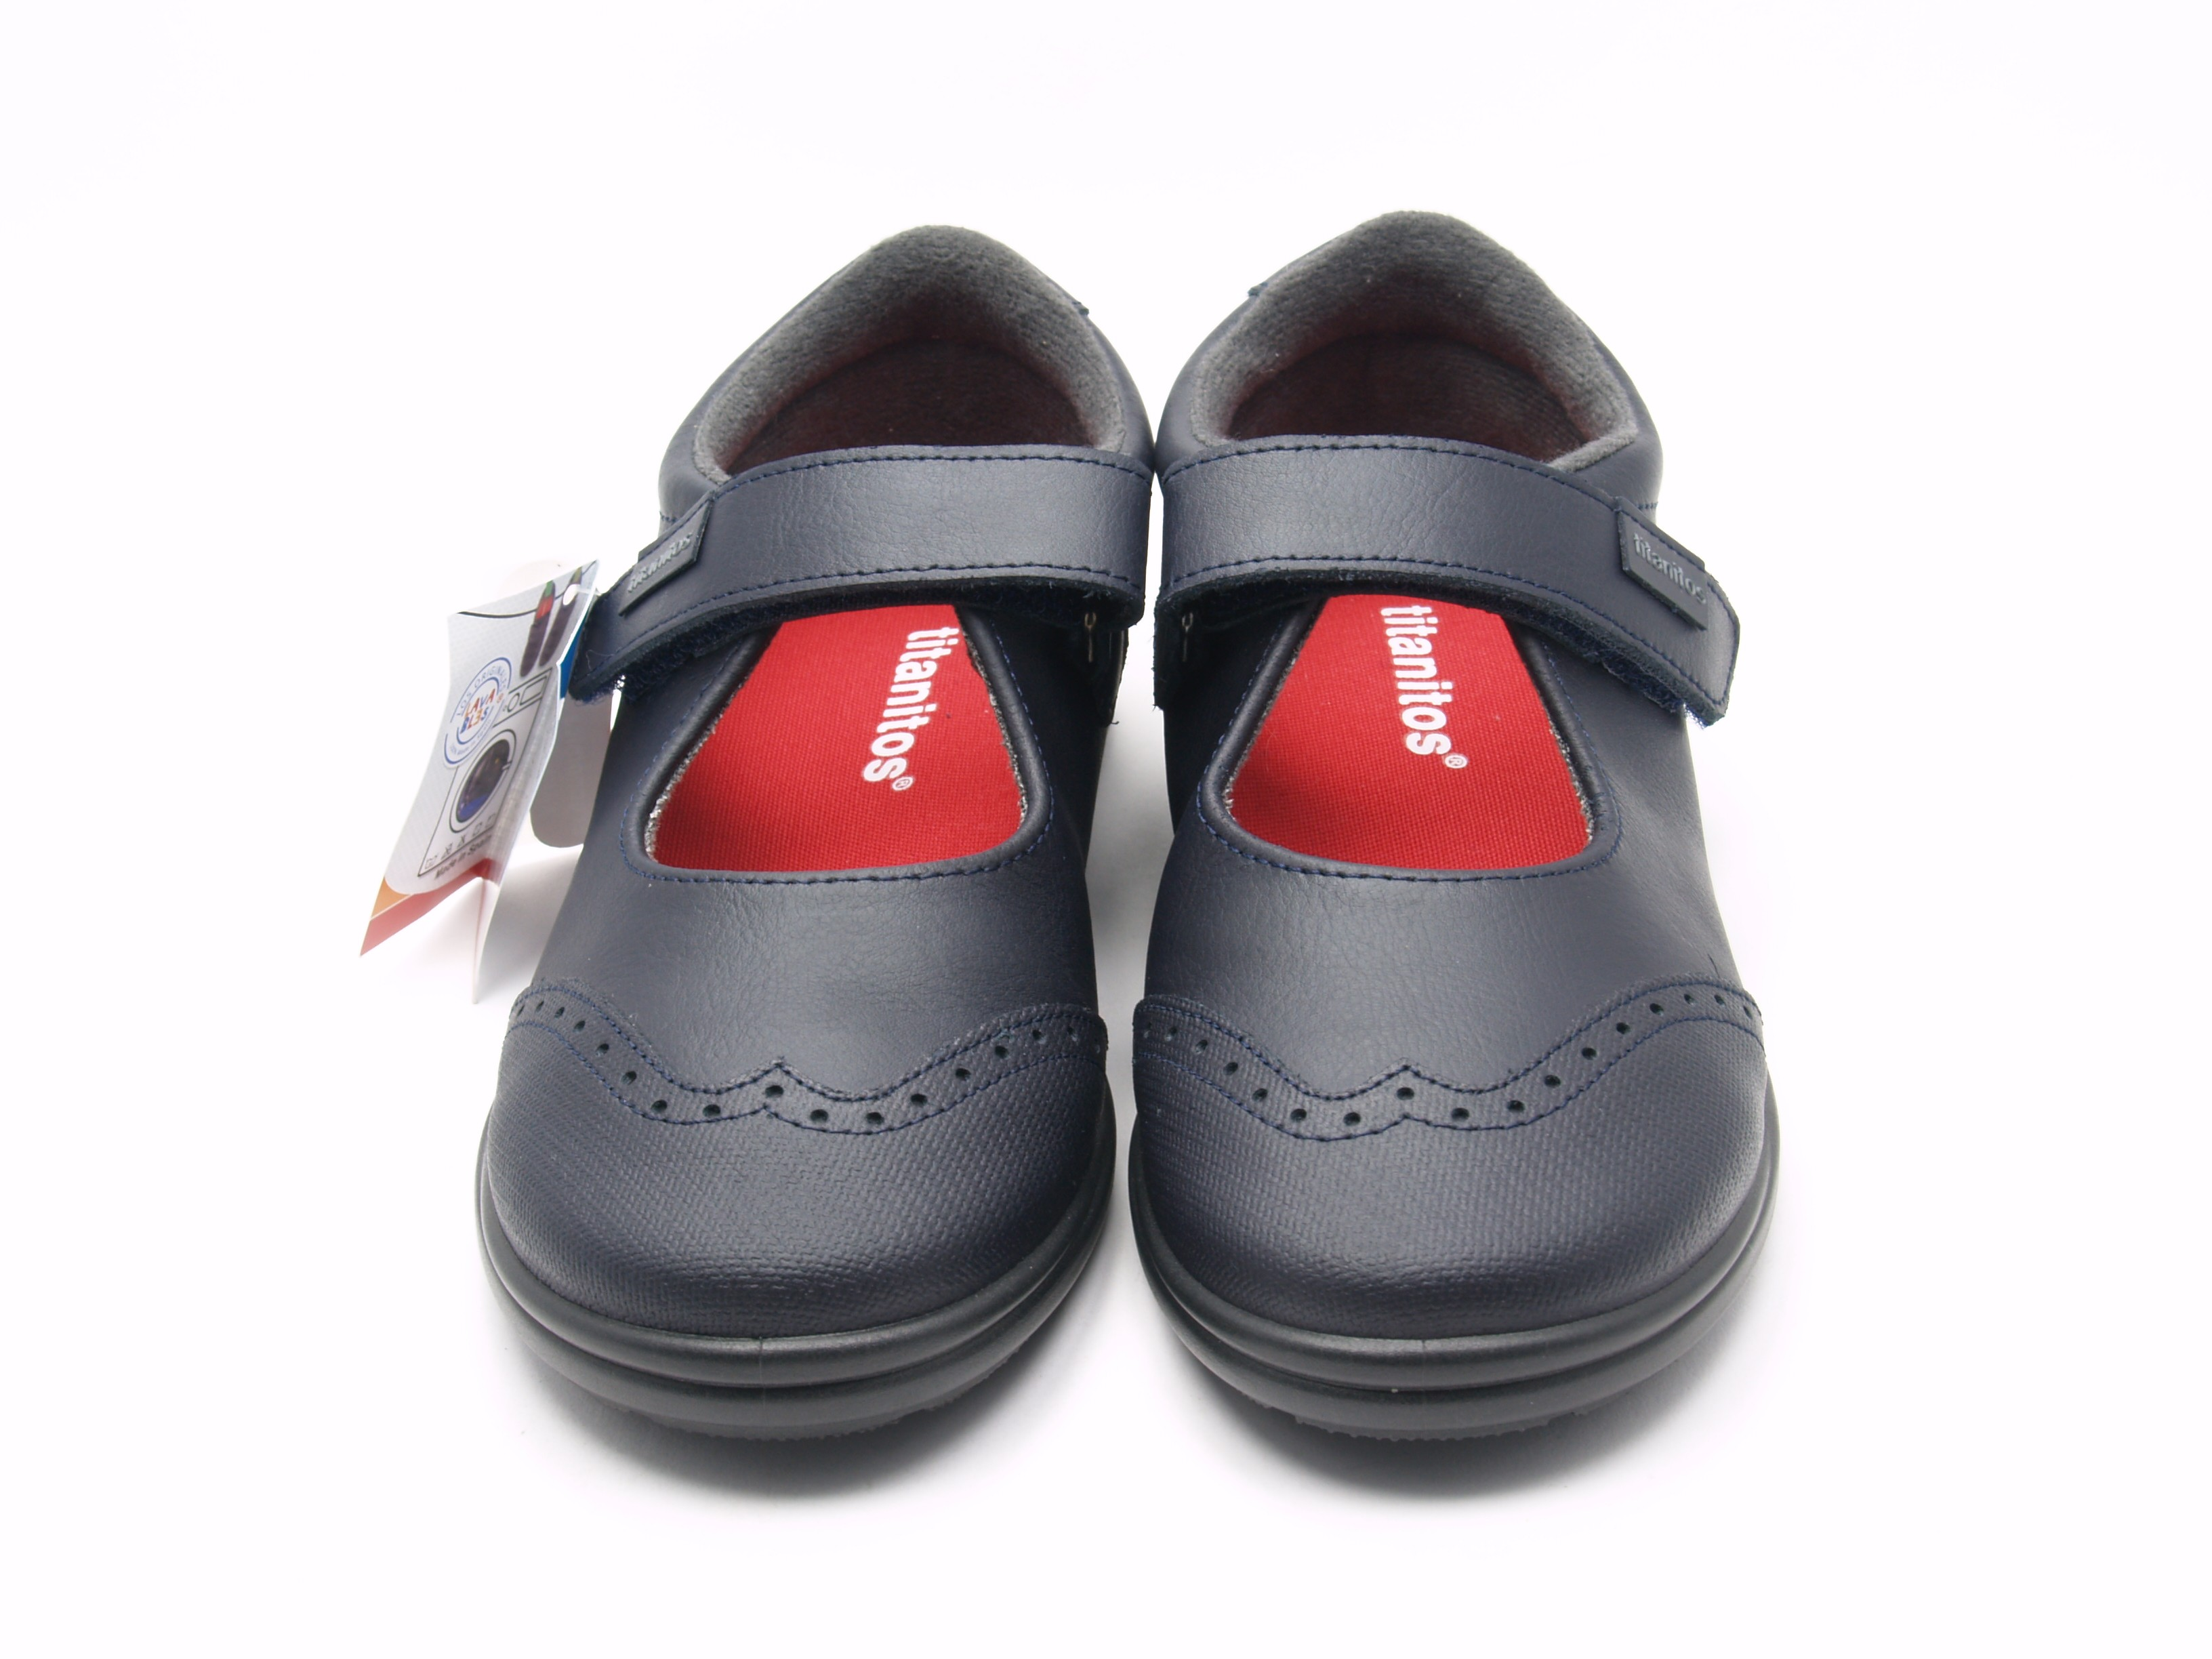 4dd253577 Zapatos Niña Colegial Lavables T940 FEBE Titantiros